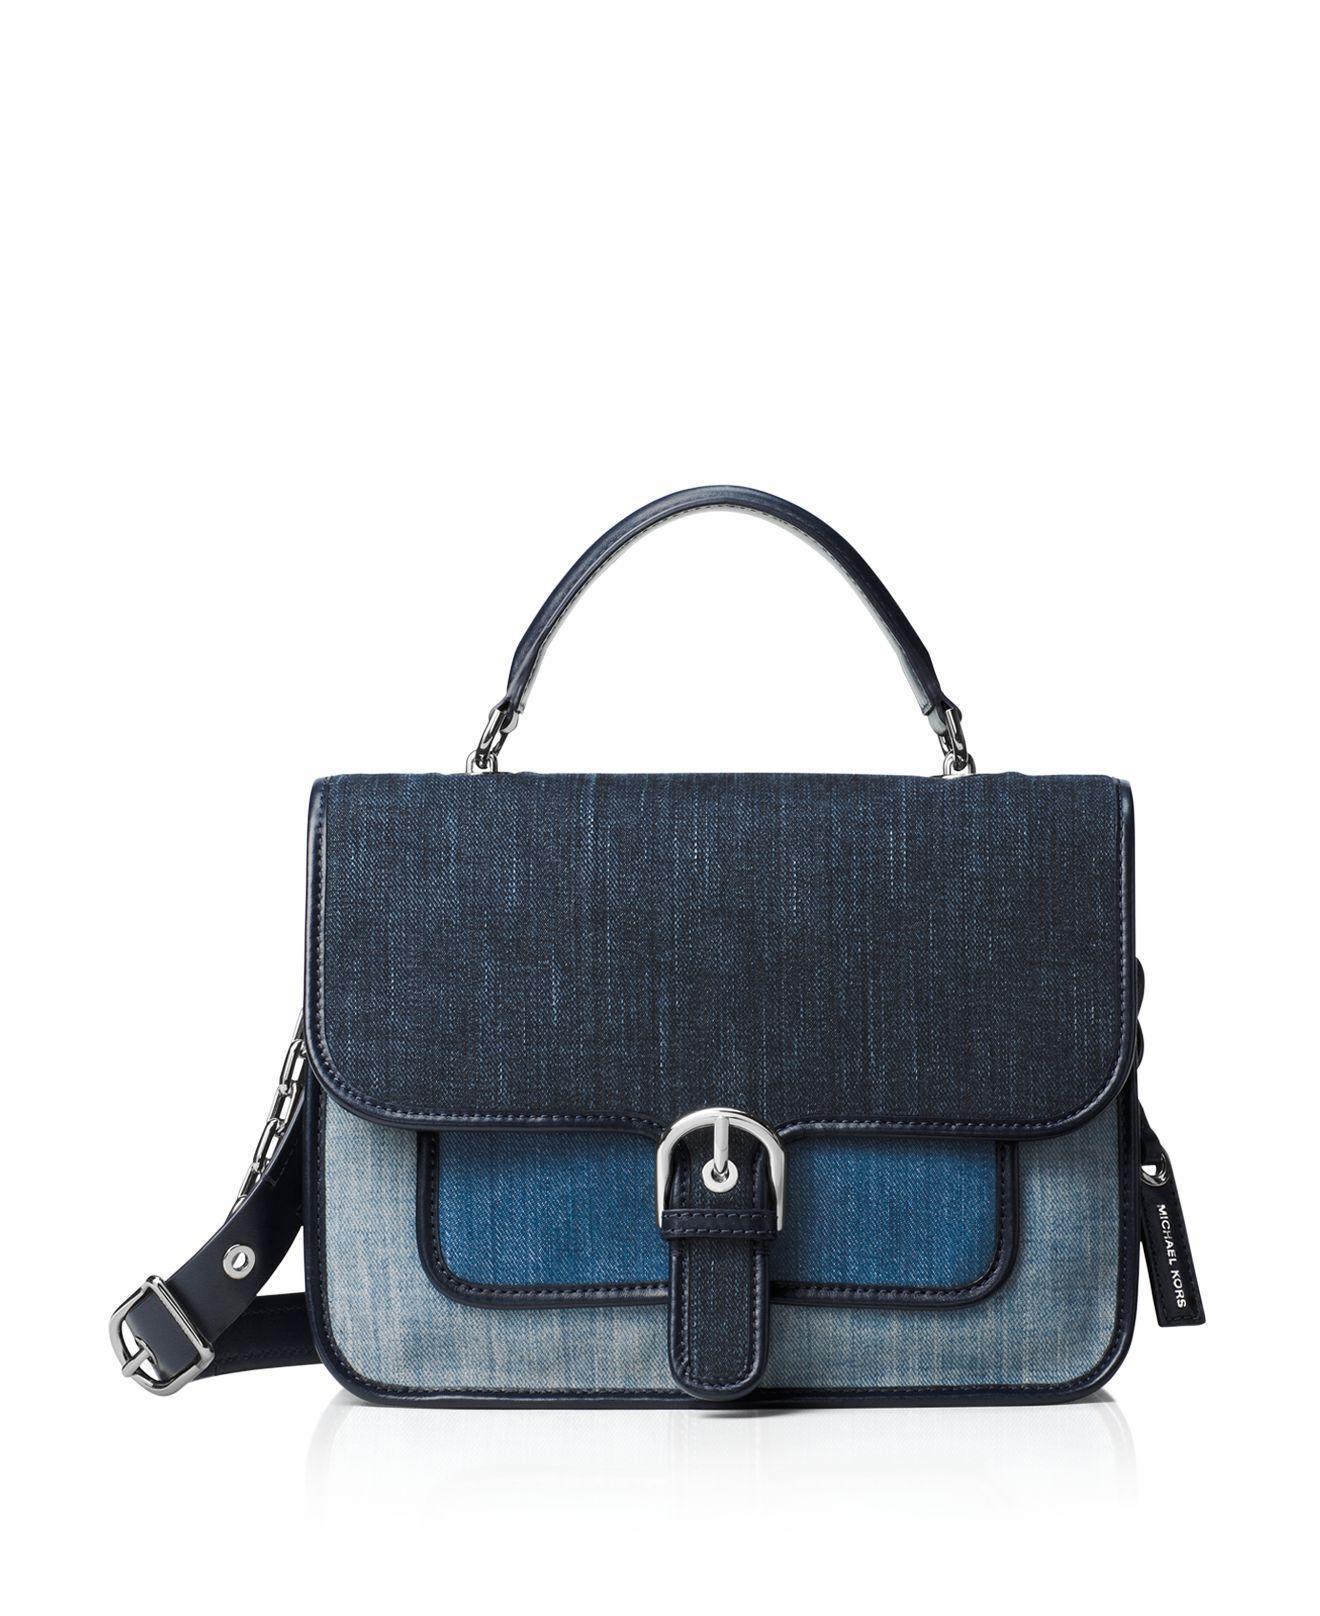 297b256de8f8 MICHAEL Michael Kors Cooper Large Denim School Satchel Bag in Blue ...